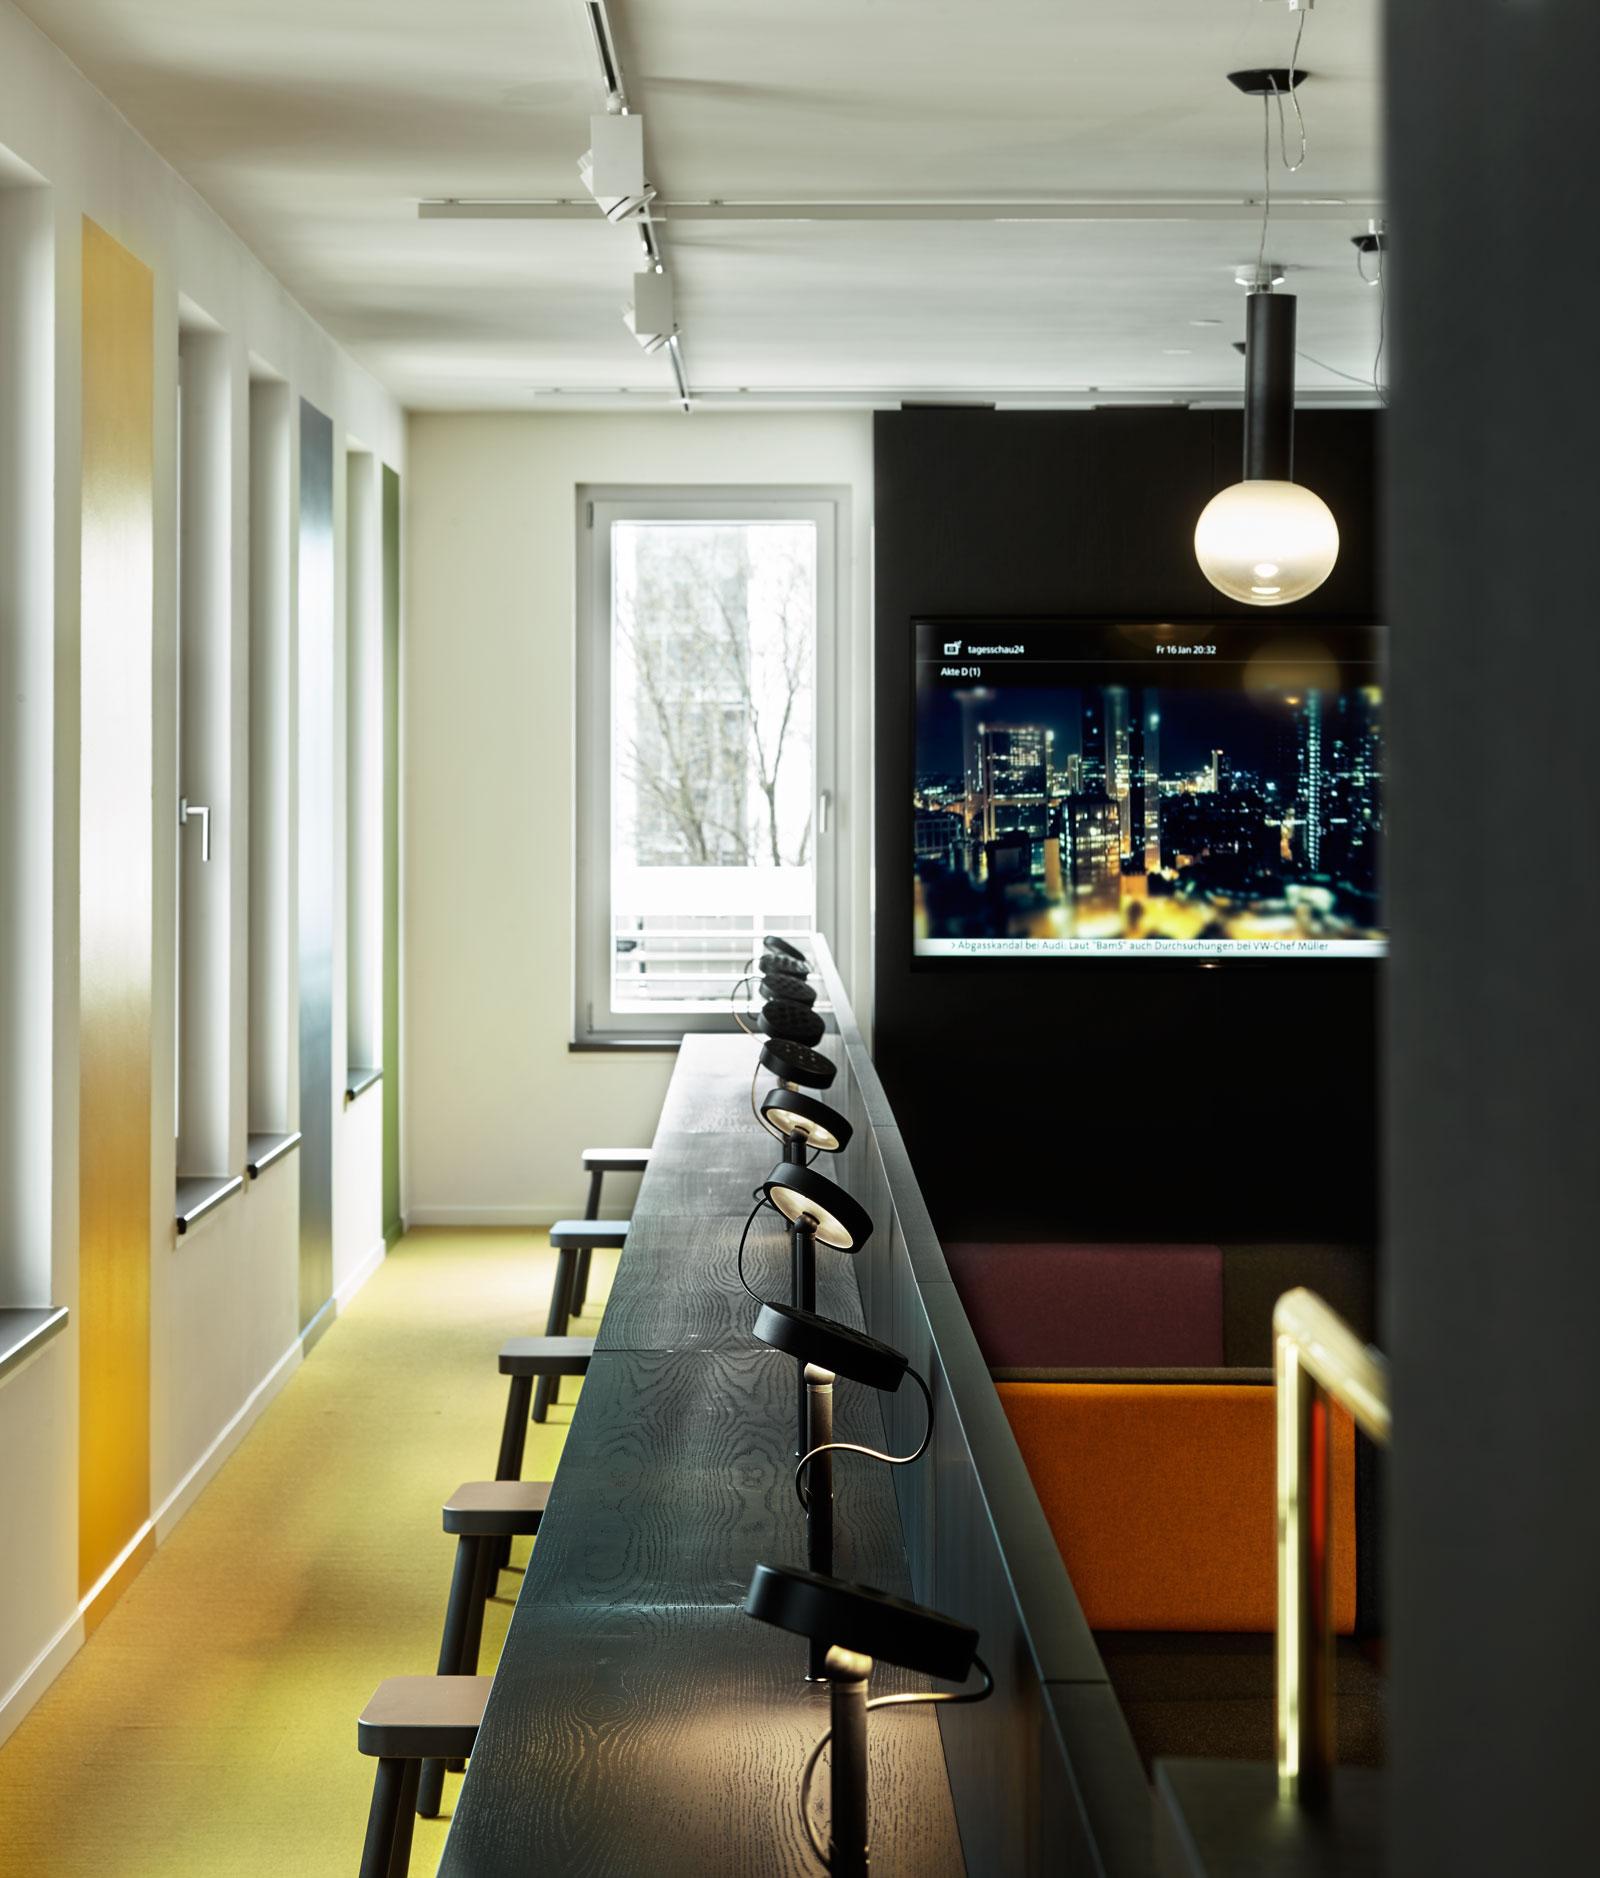 Ole Groenwoldt Muenchen Office Design Interior Bibliothek